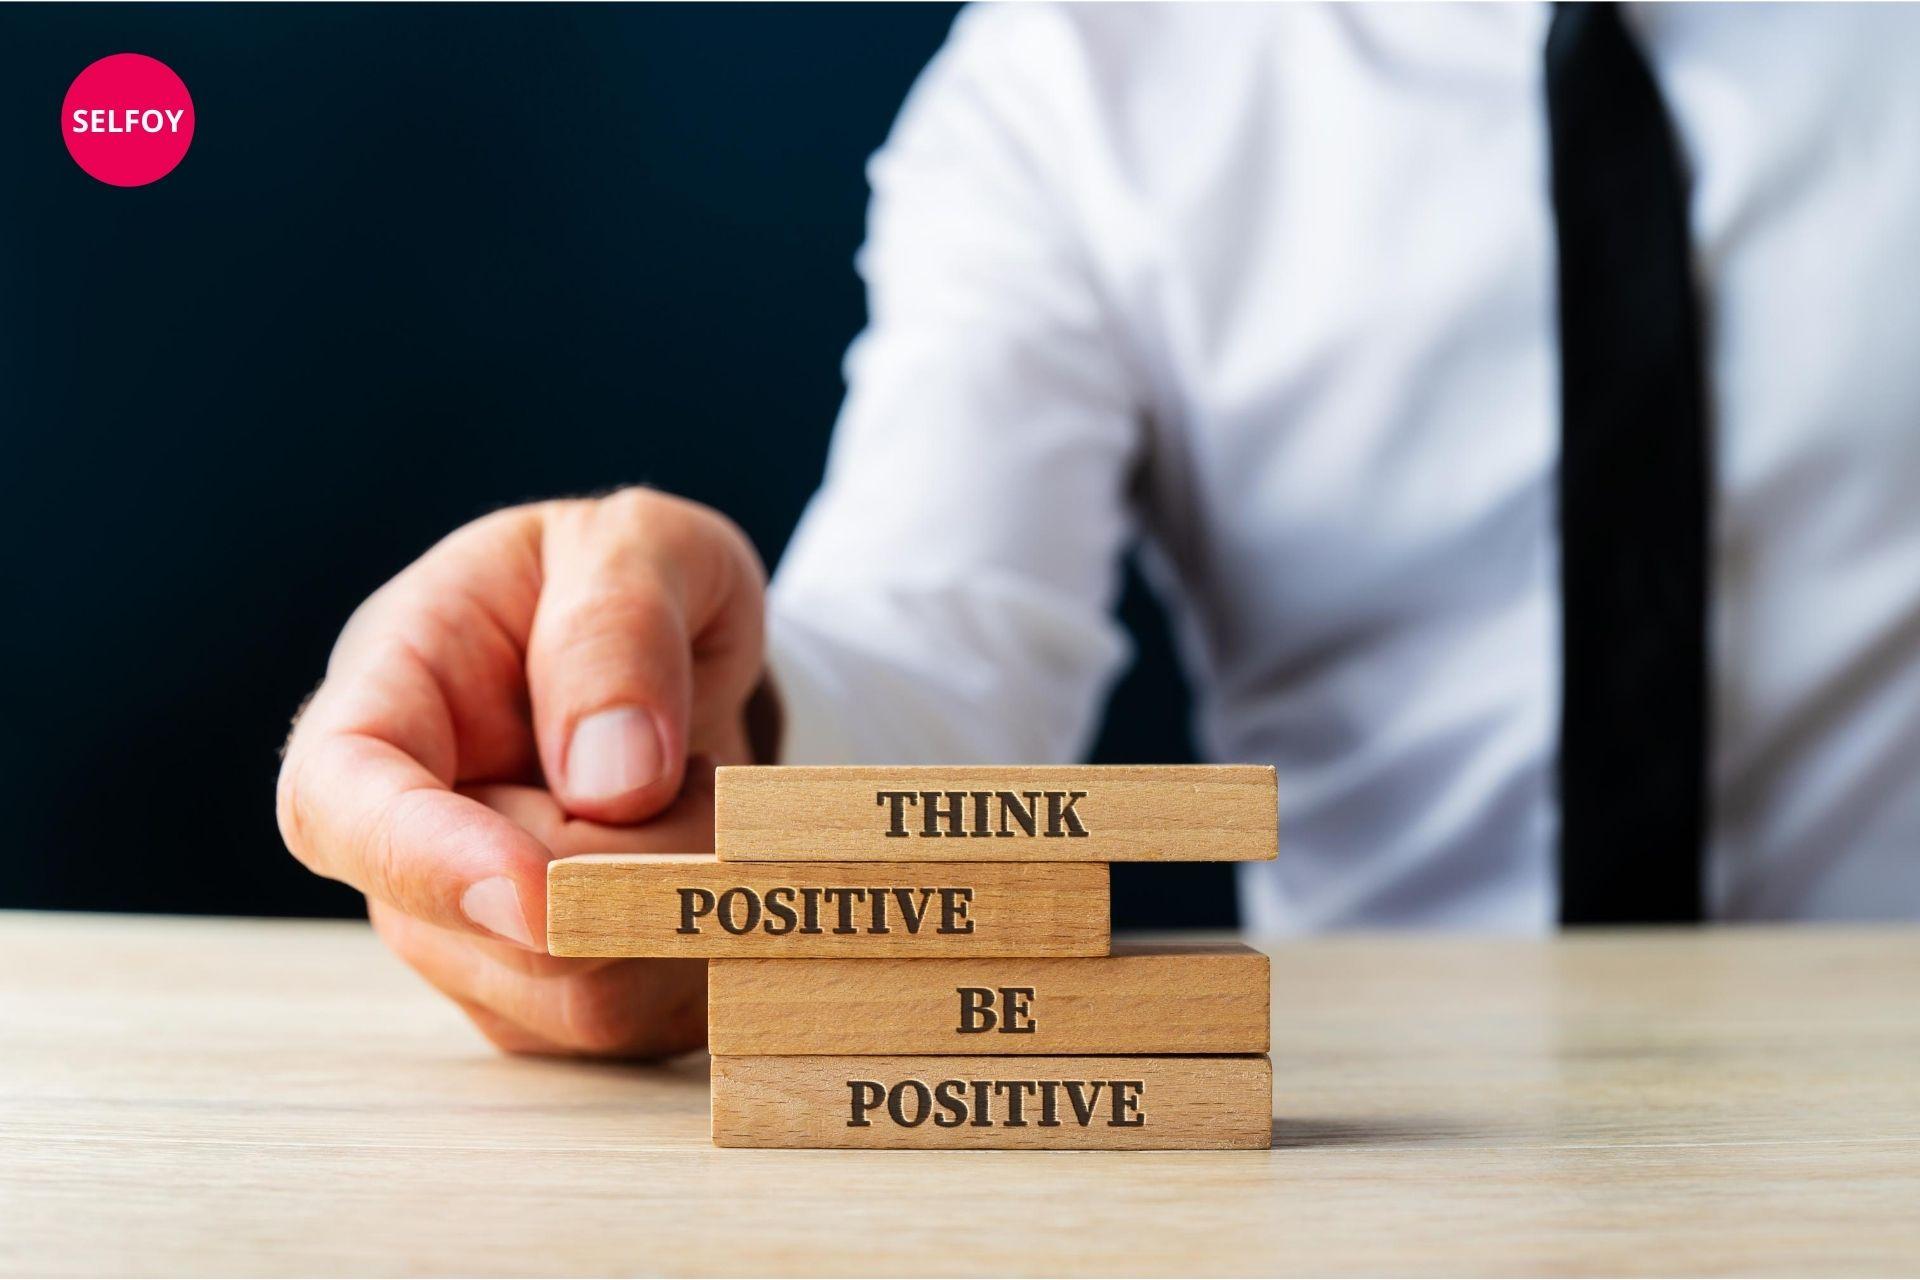 Man's hand holding wooden art written think positive be positive